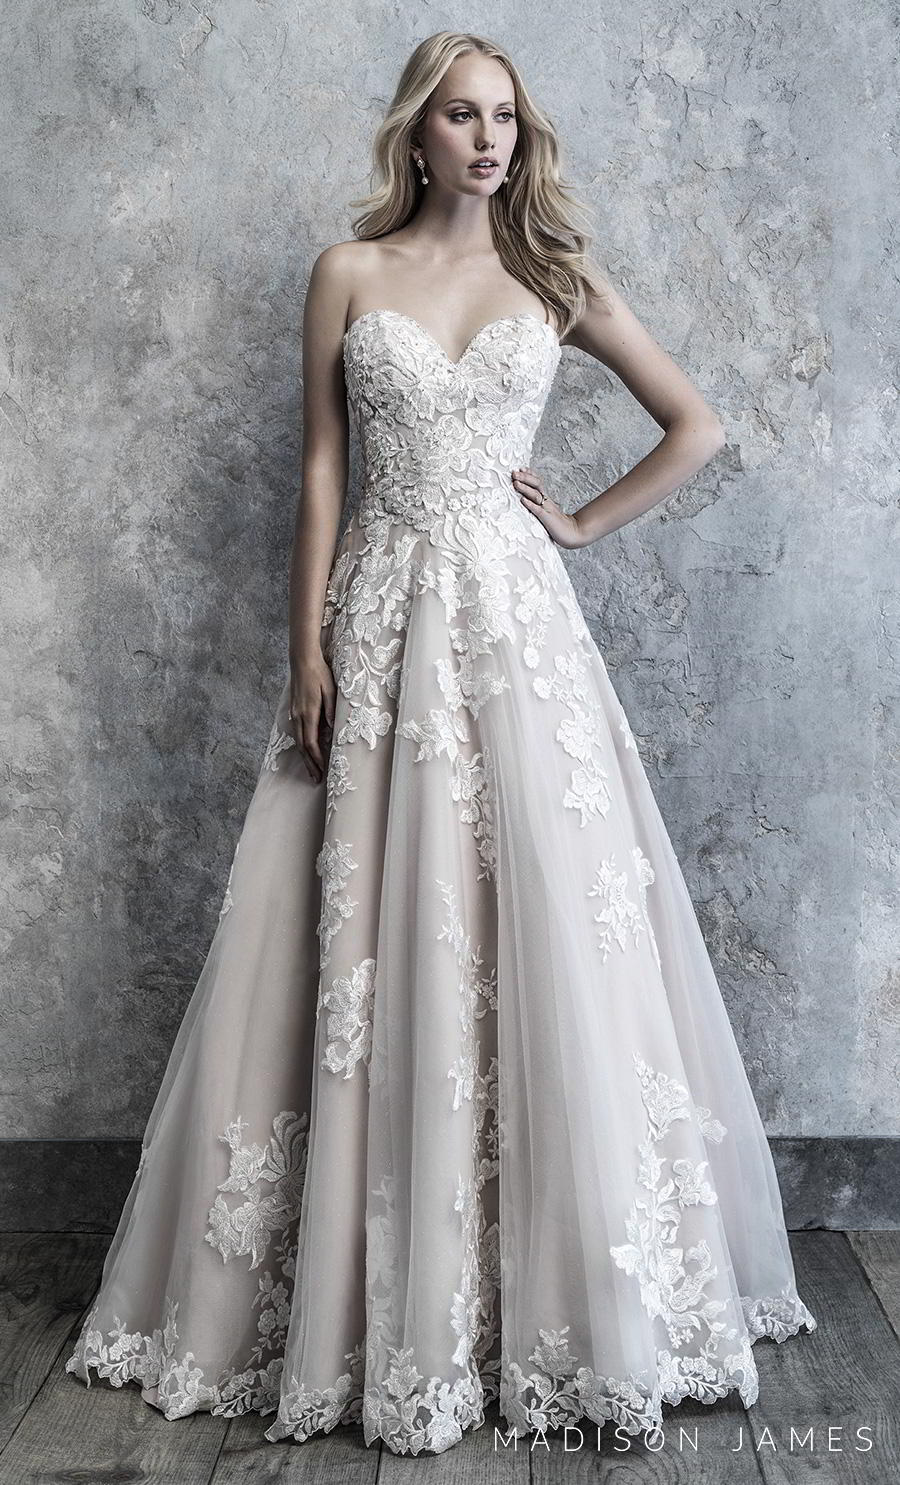 madison james 2019 bridal strapless ssweetheart neckline heavily embellished bodice hem romantic a line wedding dress mid back chapel train (516) mv